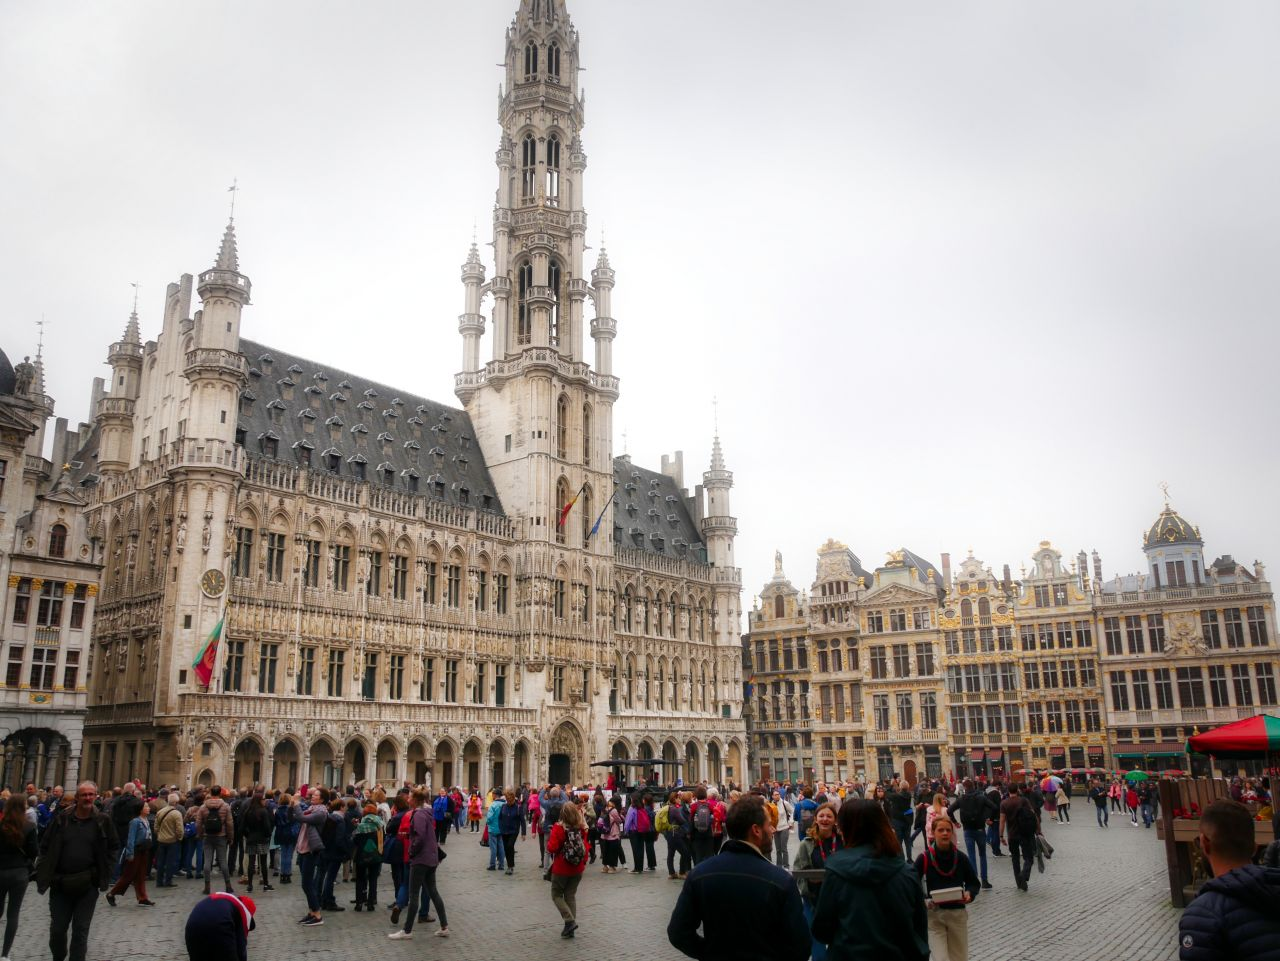 Brussel Grote Markt8